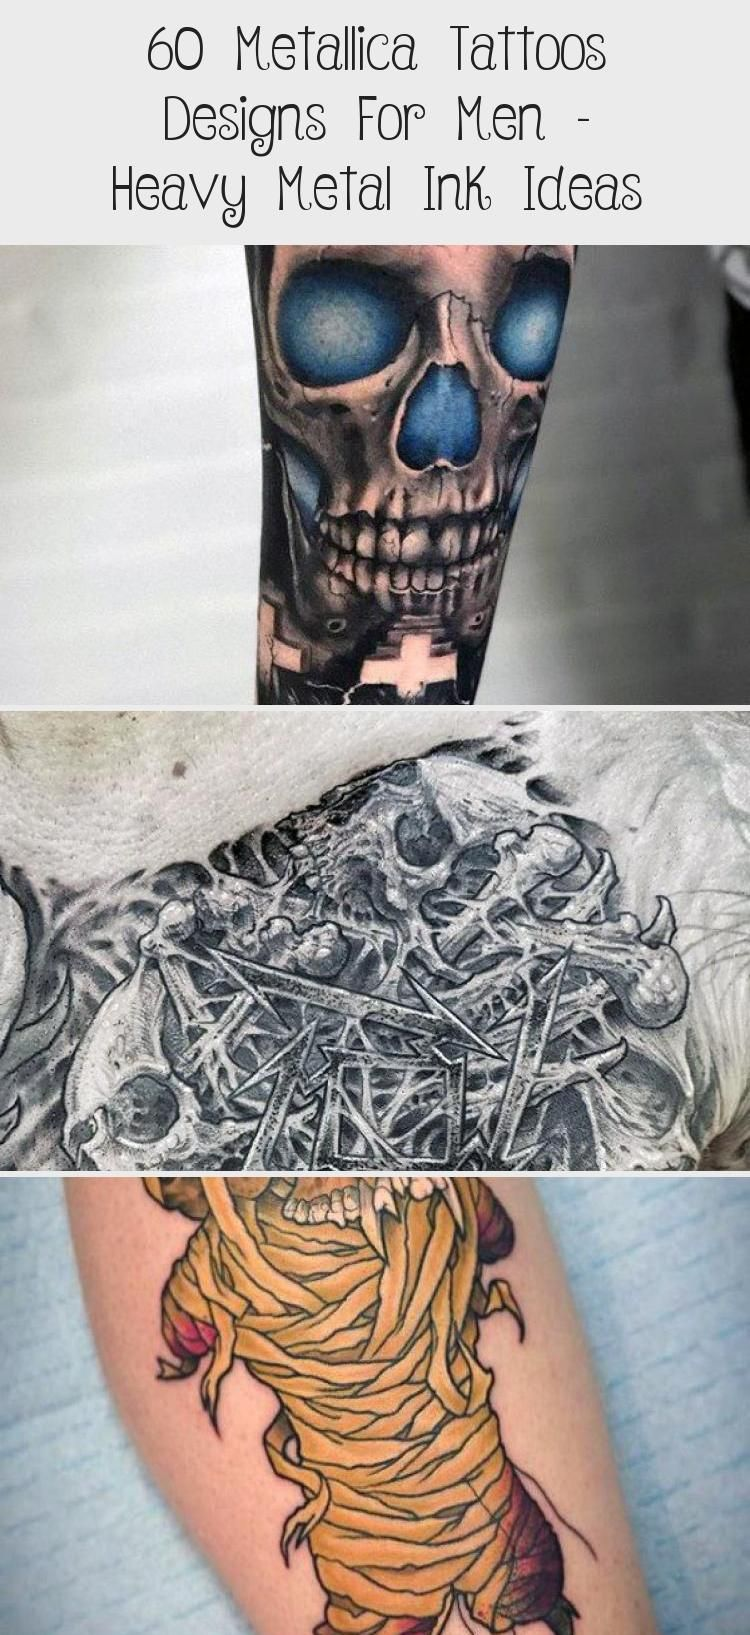 60 Metallica Tattoos Designs For Men - Heavy Metal Ink